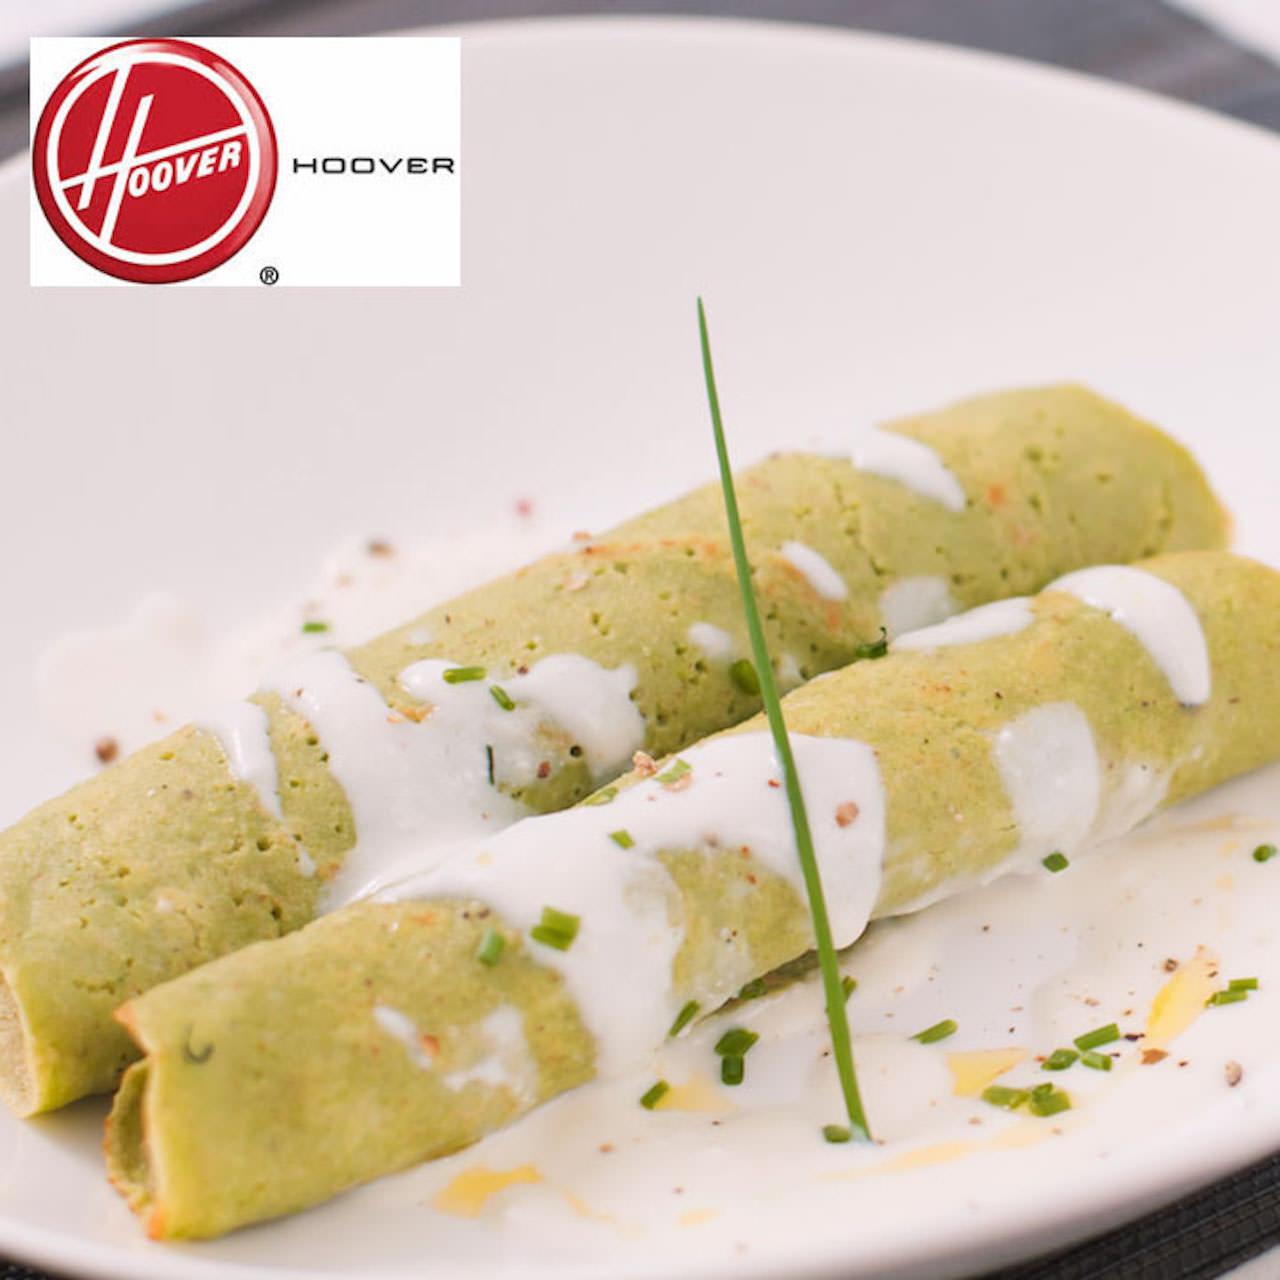 8-HOOVER-Cannelloni-ai-piselli